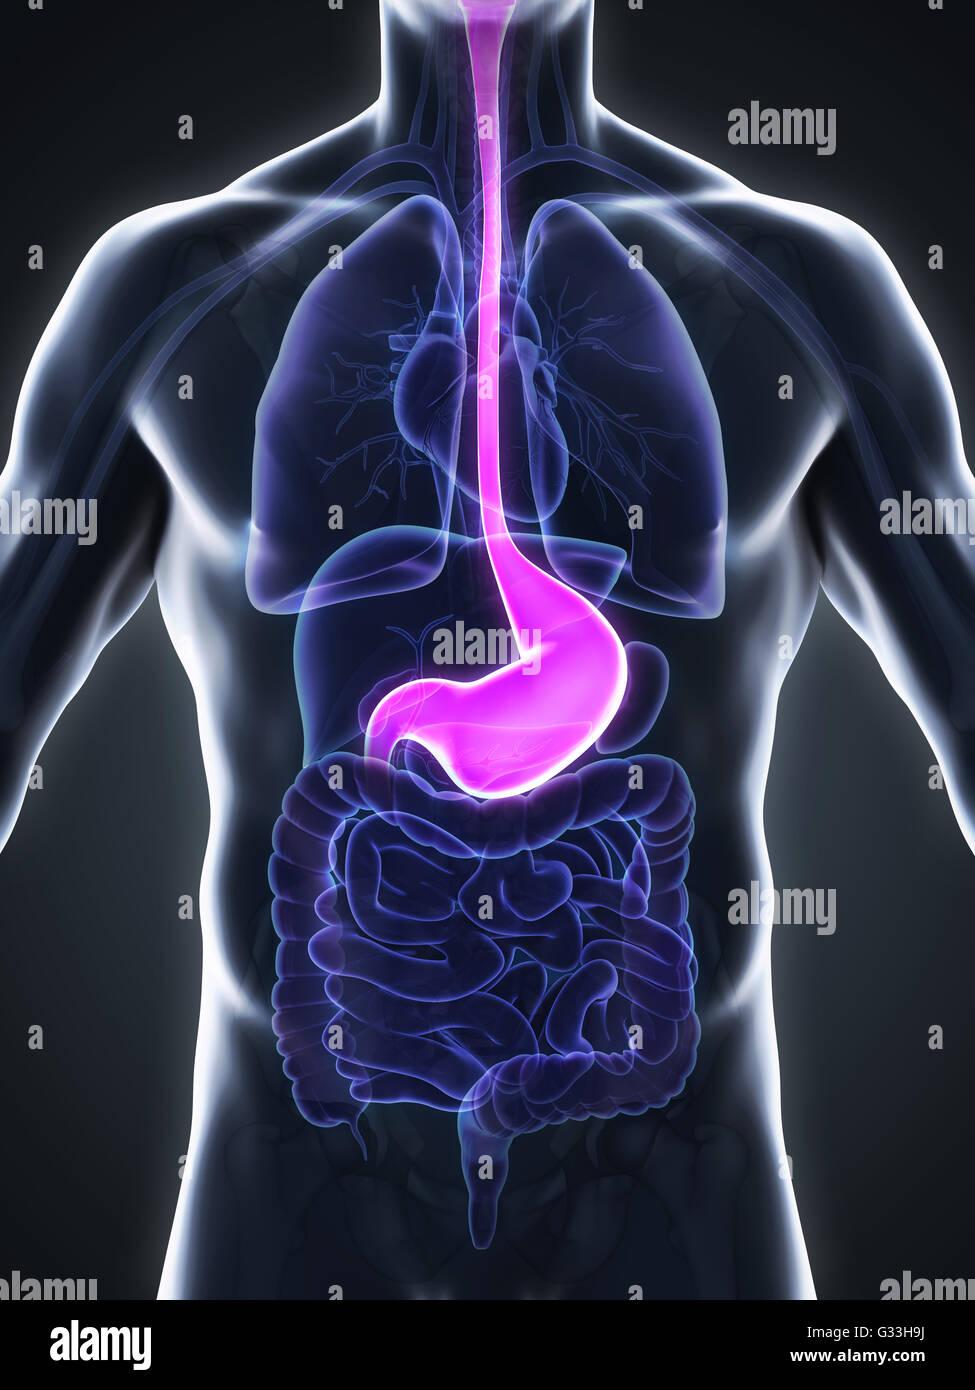 Human Stomach Anatomy Stock Photo 105185630 Alamy